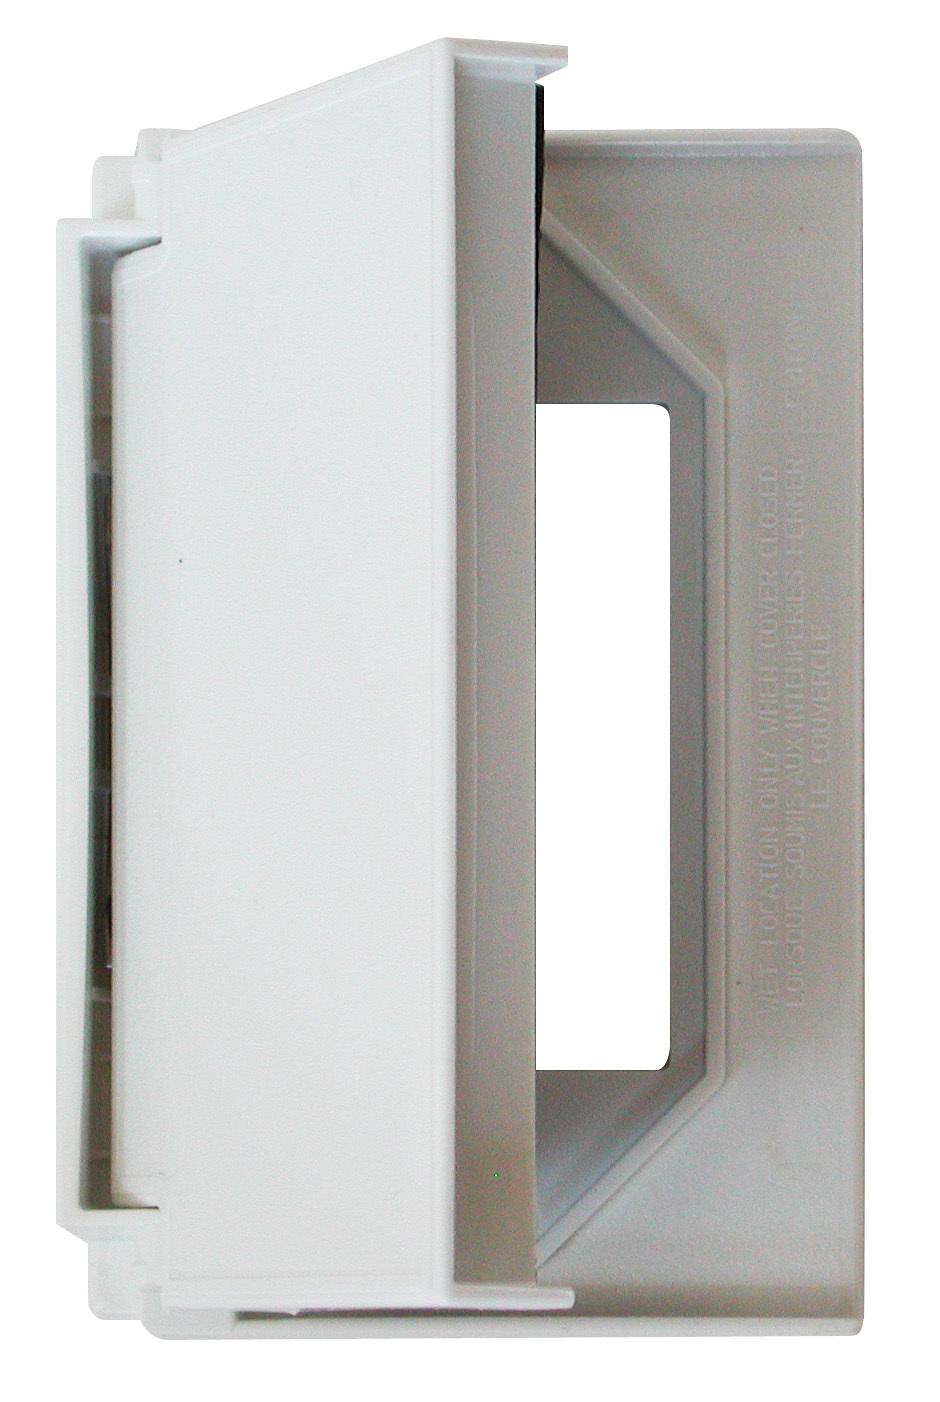 Decor Receptacle Cover - White 52516